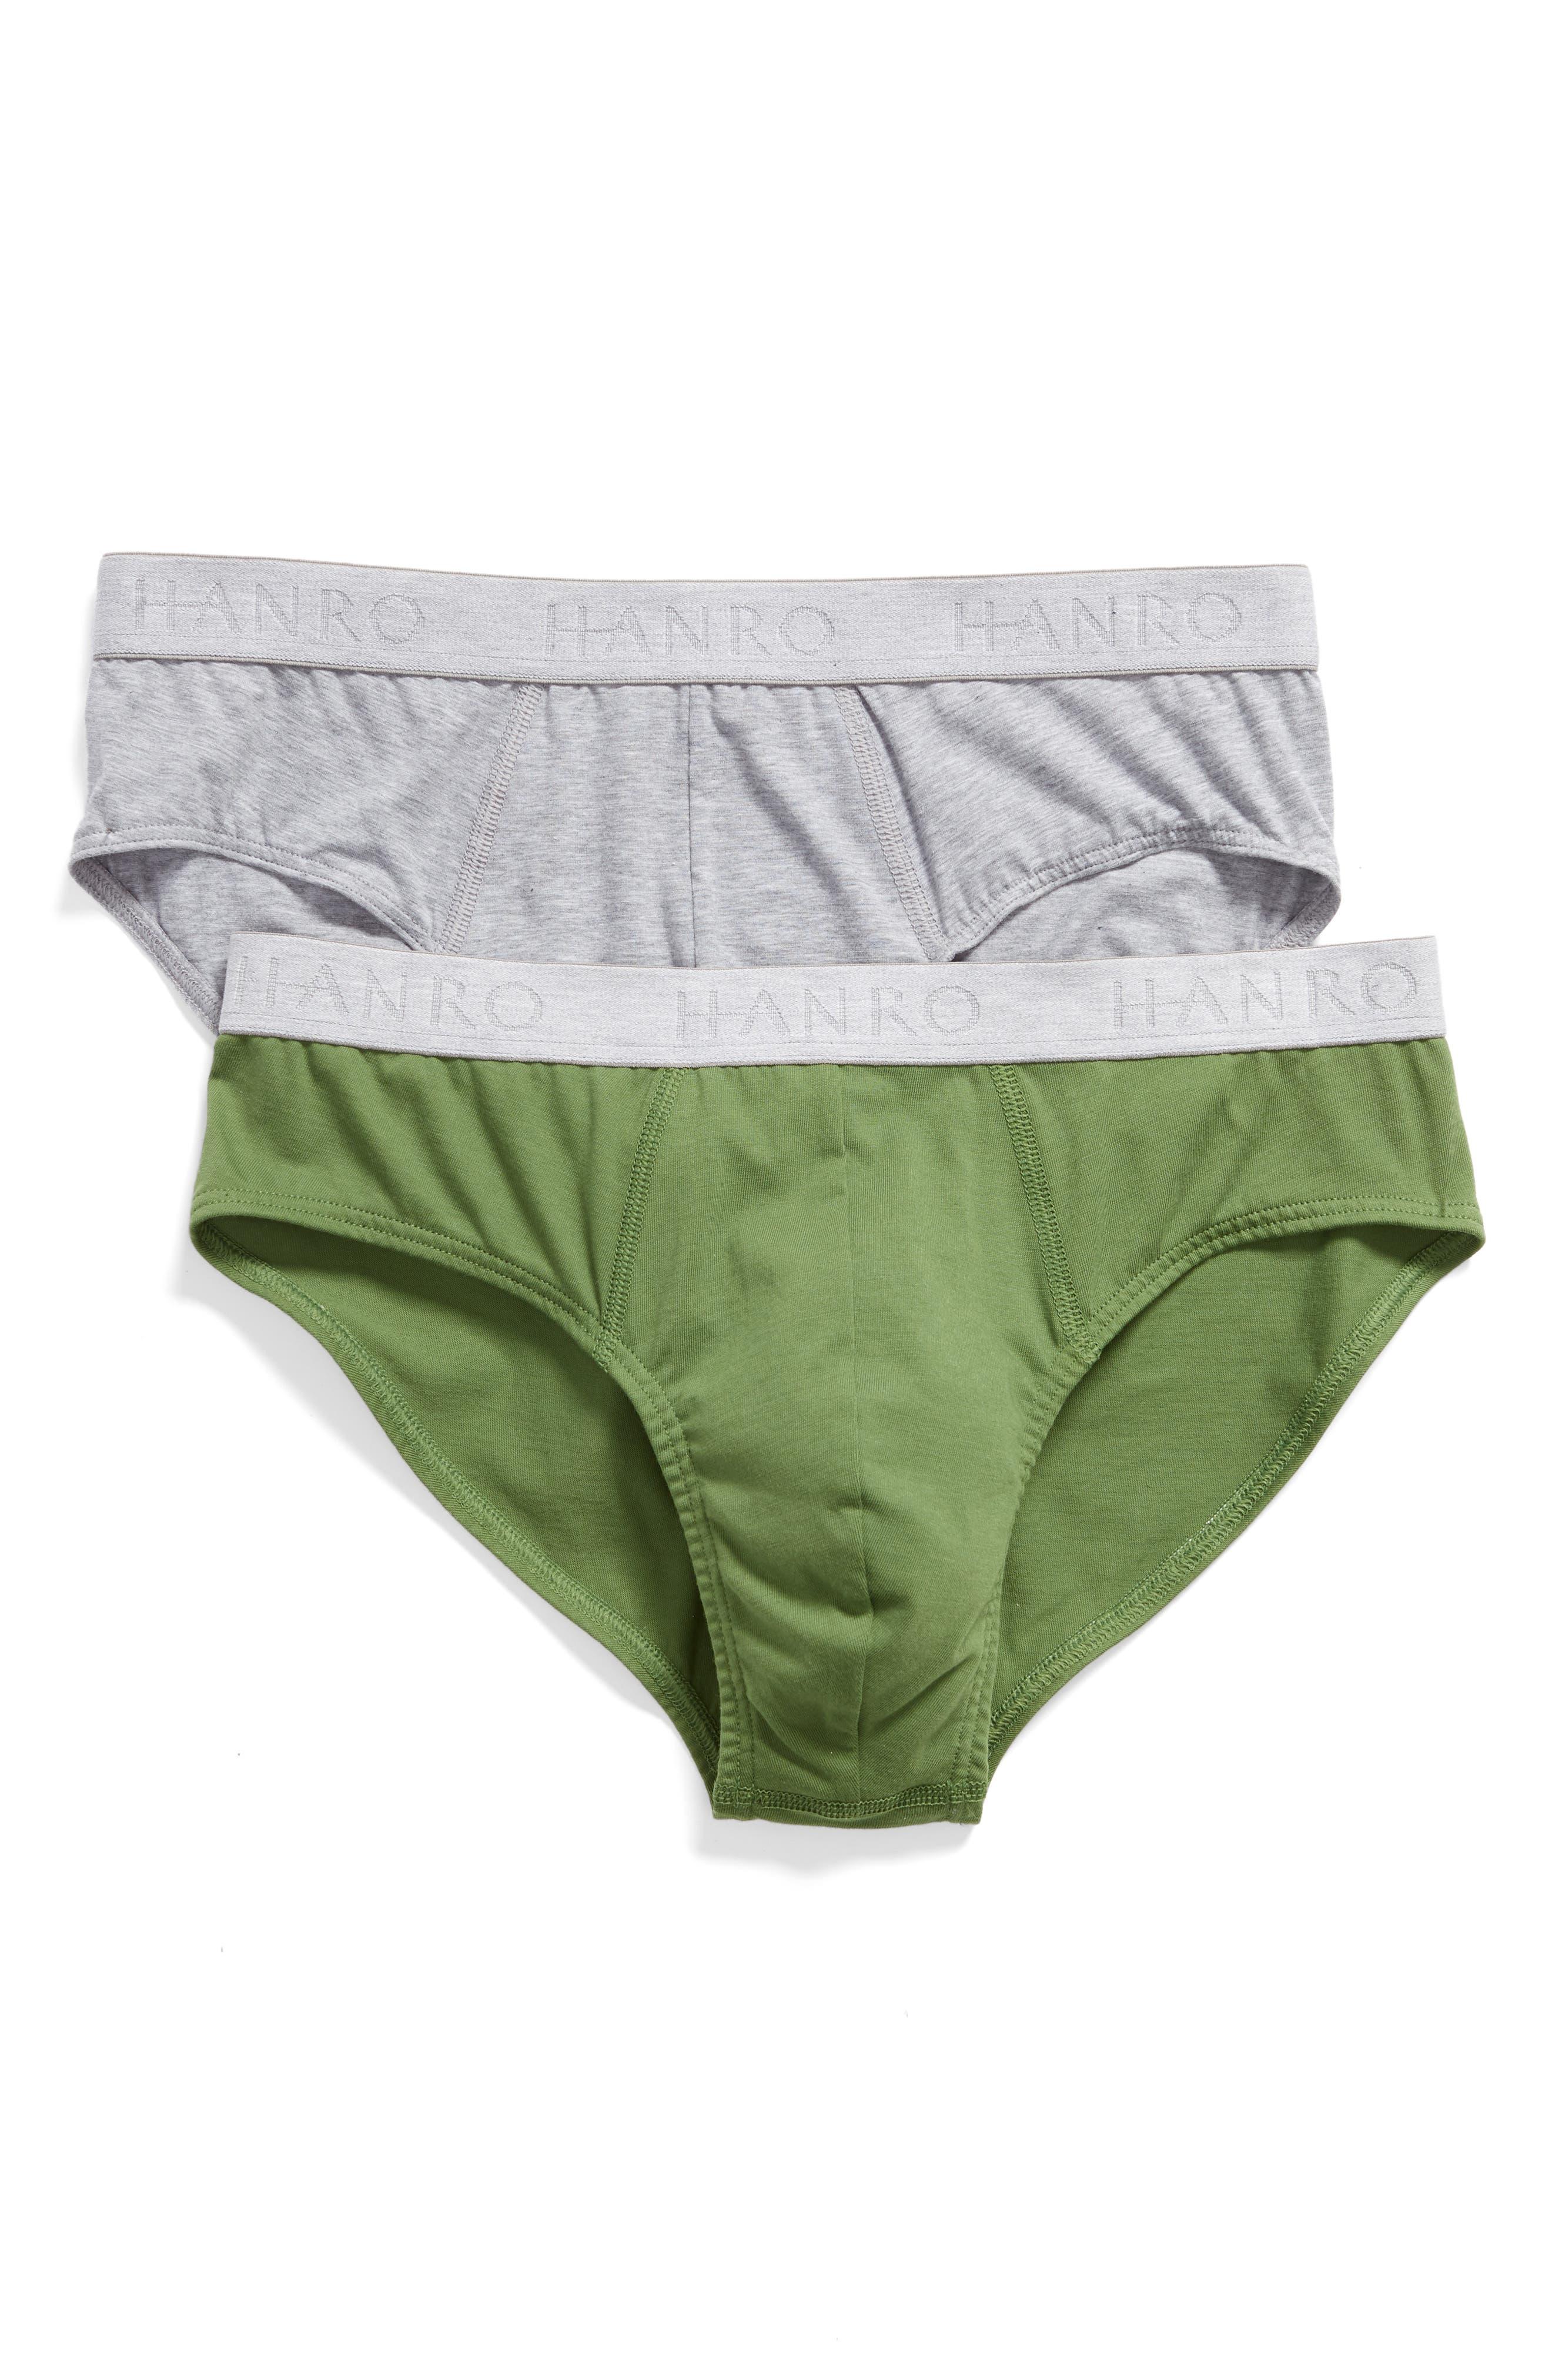 35b301b4ab5 Men s Hanro Underwear